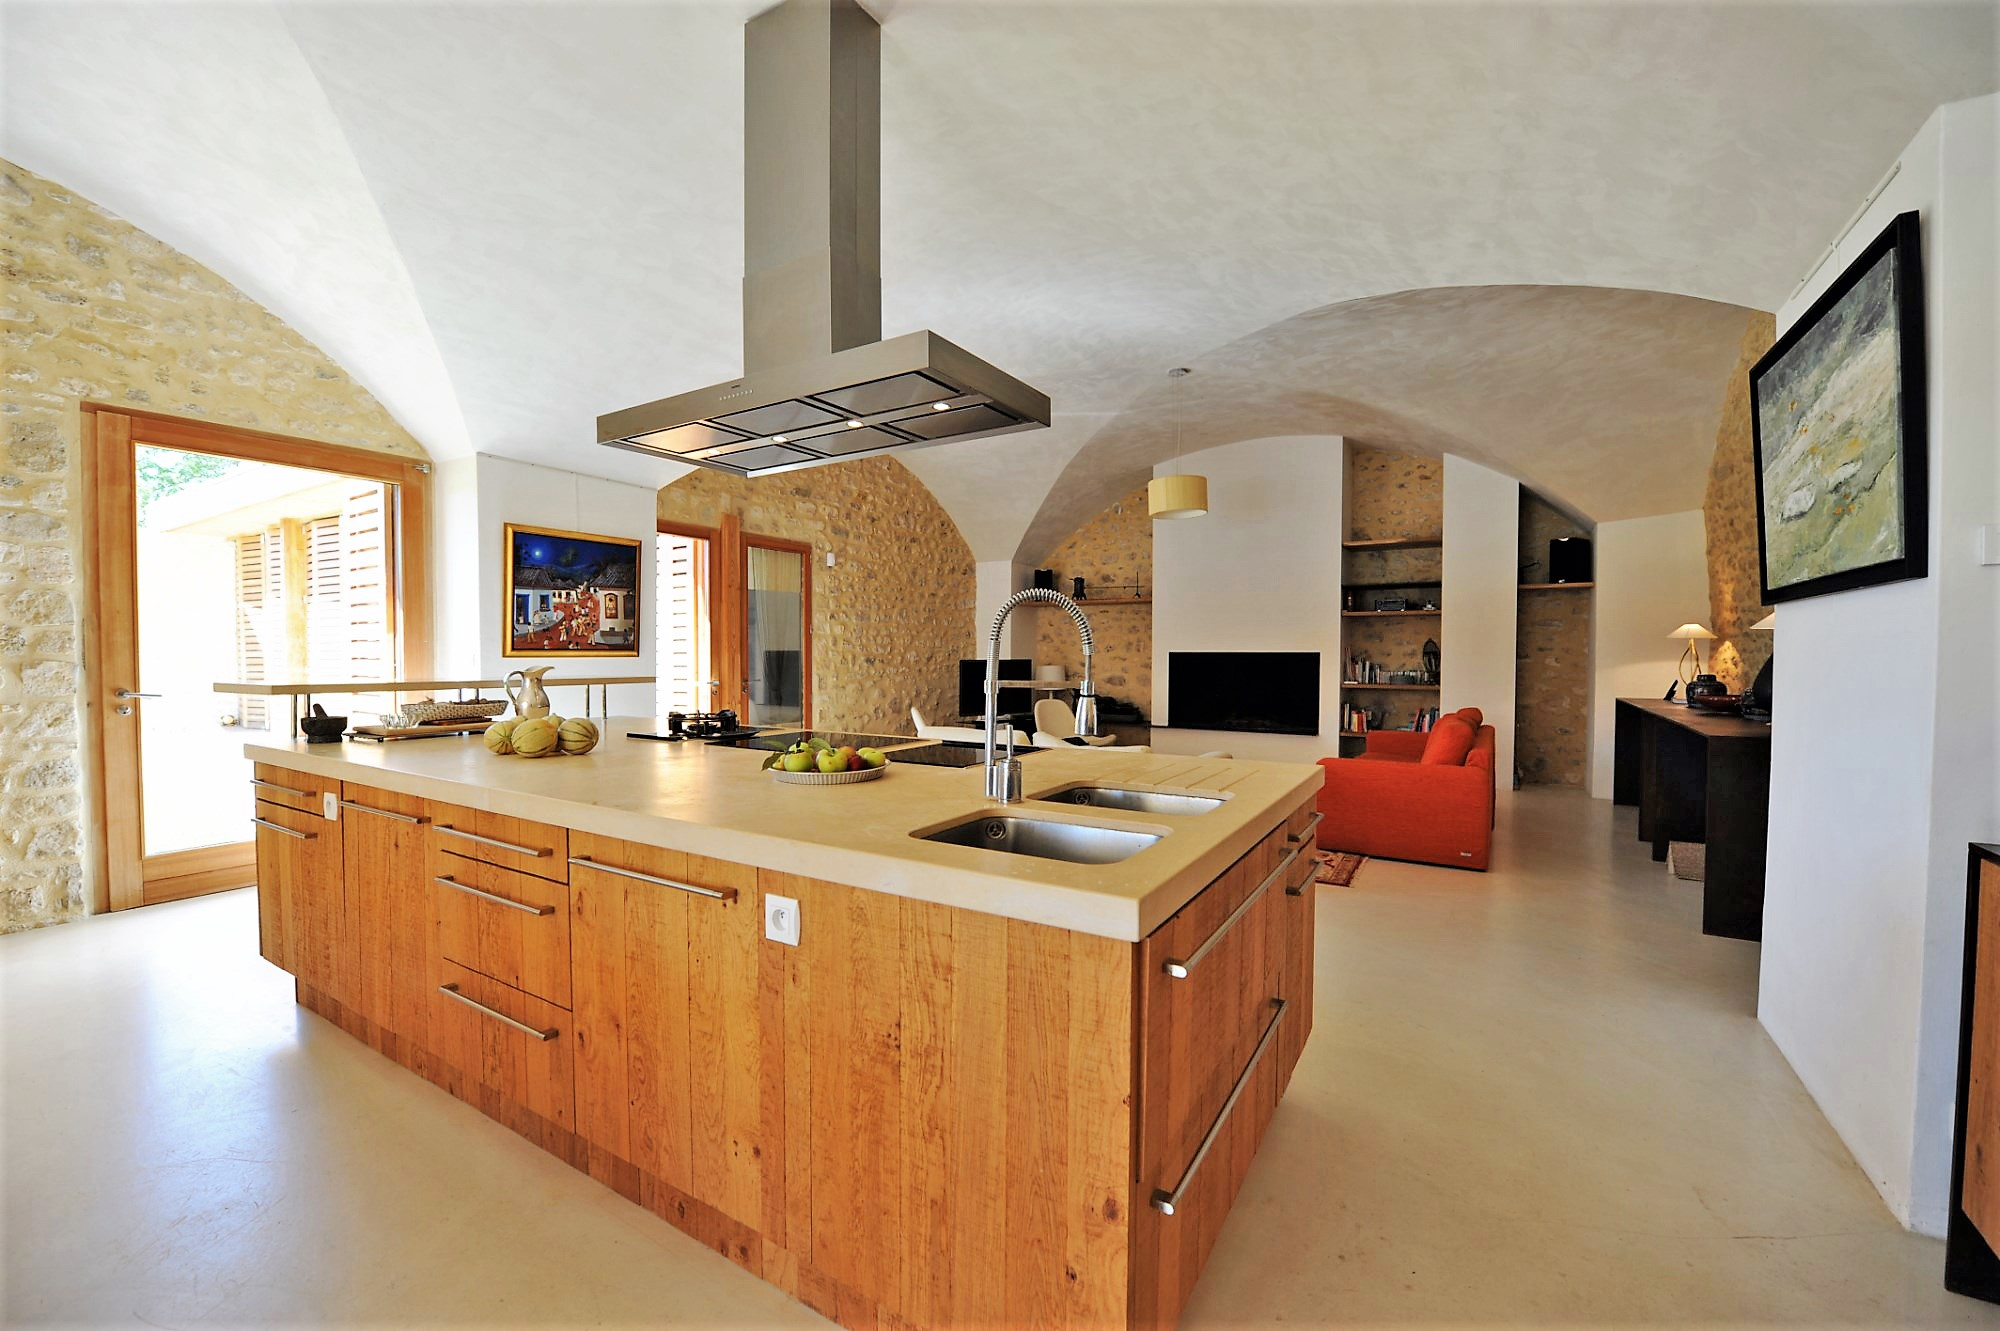 Belle propriété face au grand Luberon